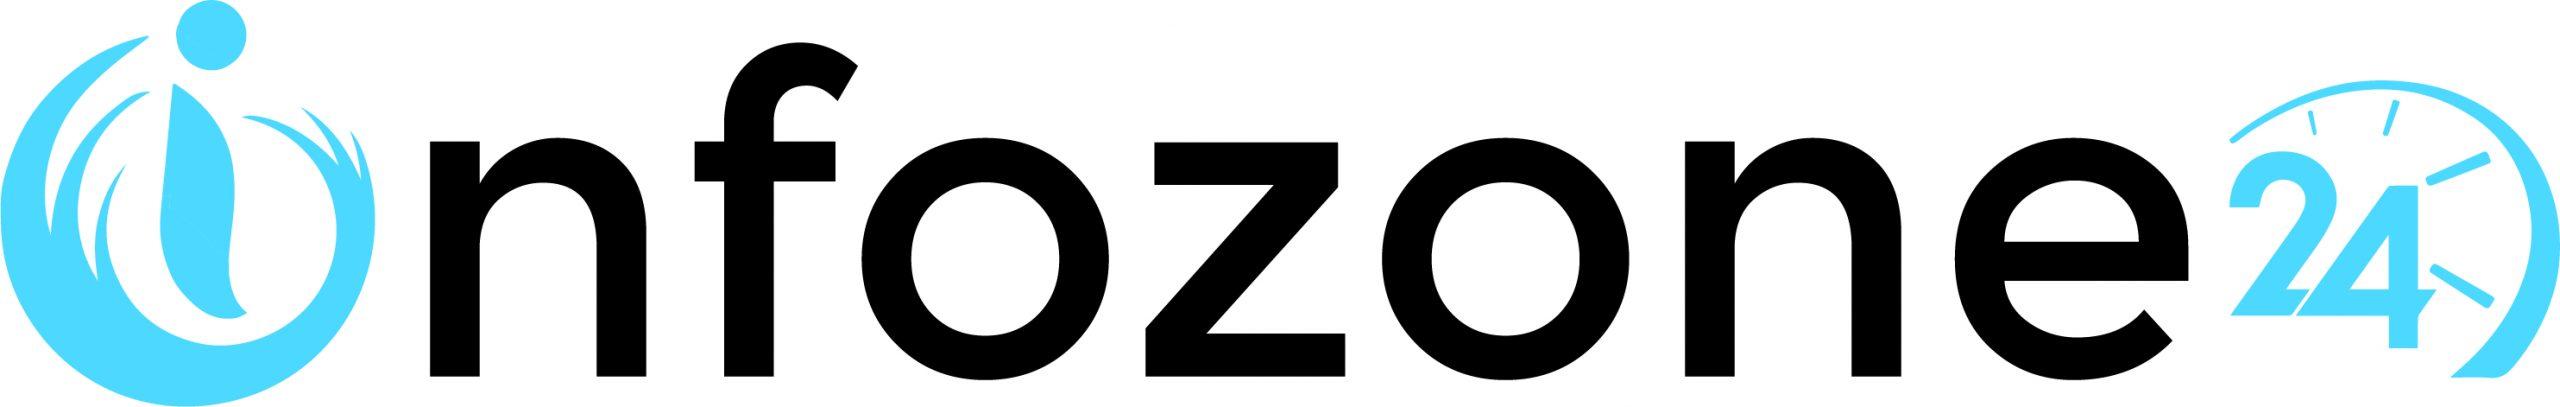 Infozone24